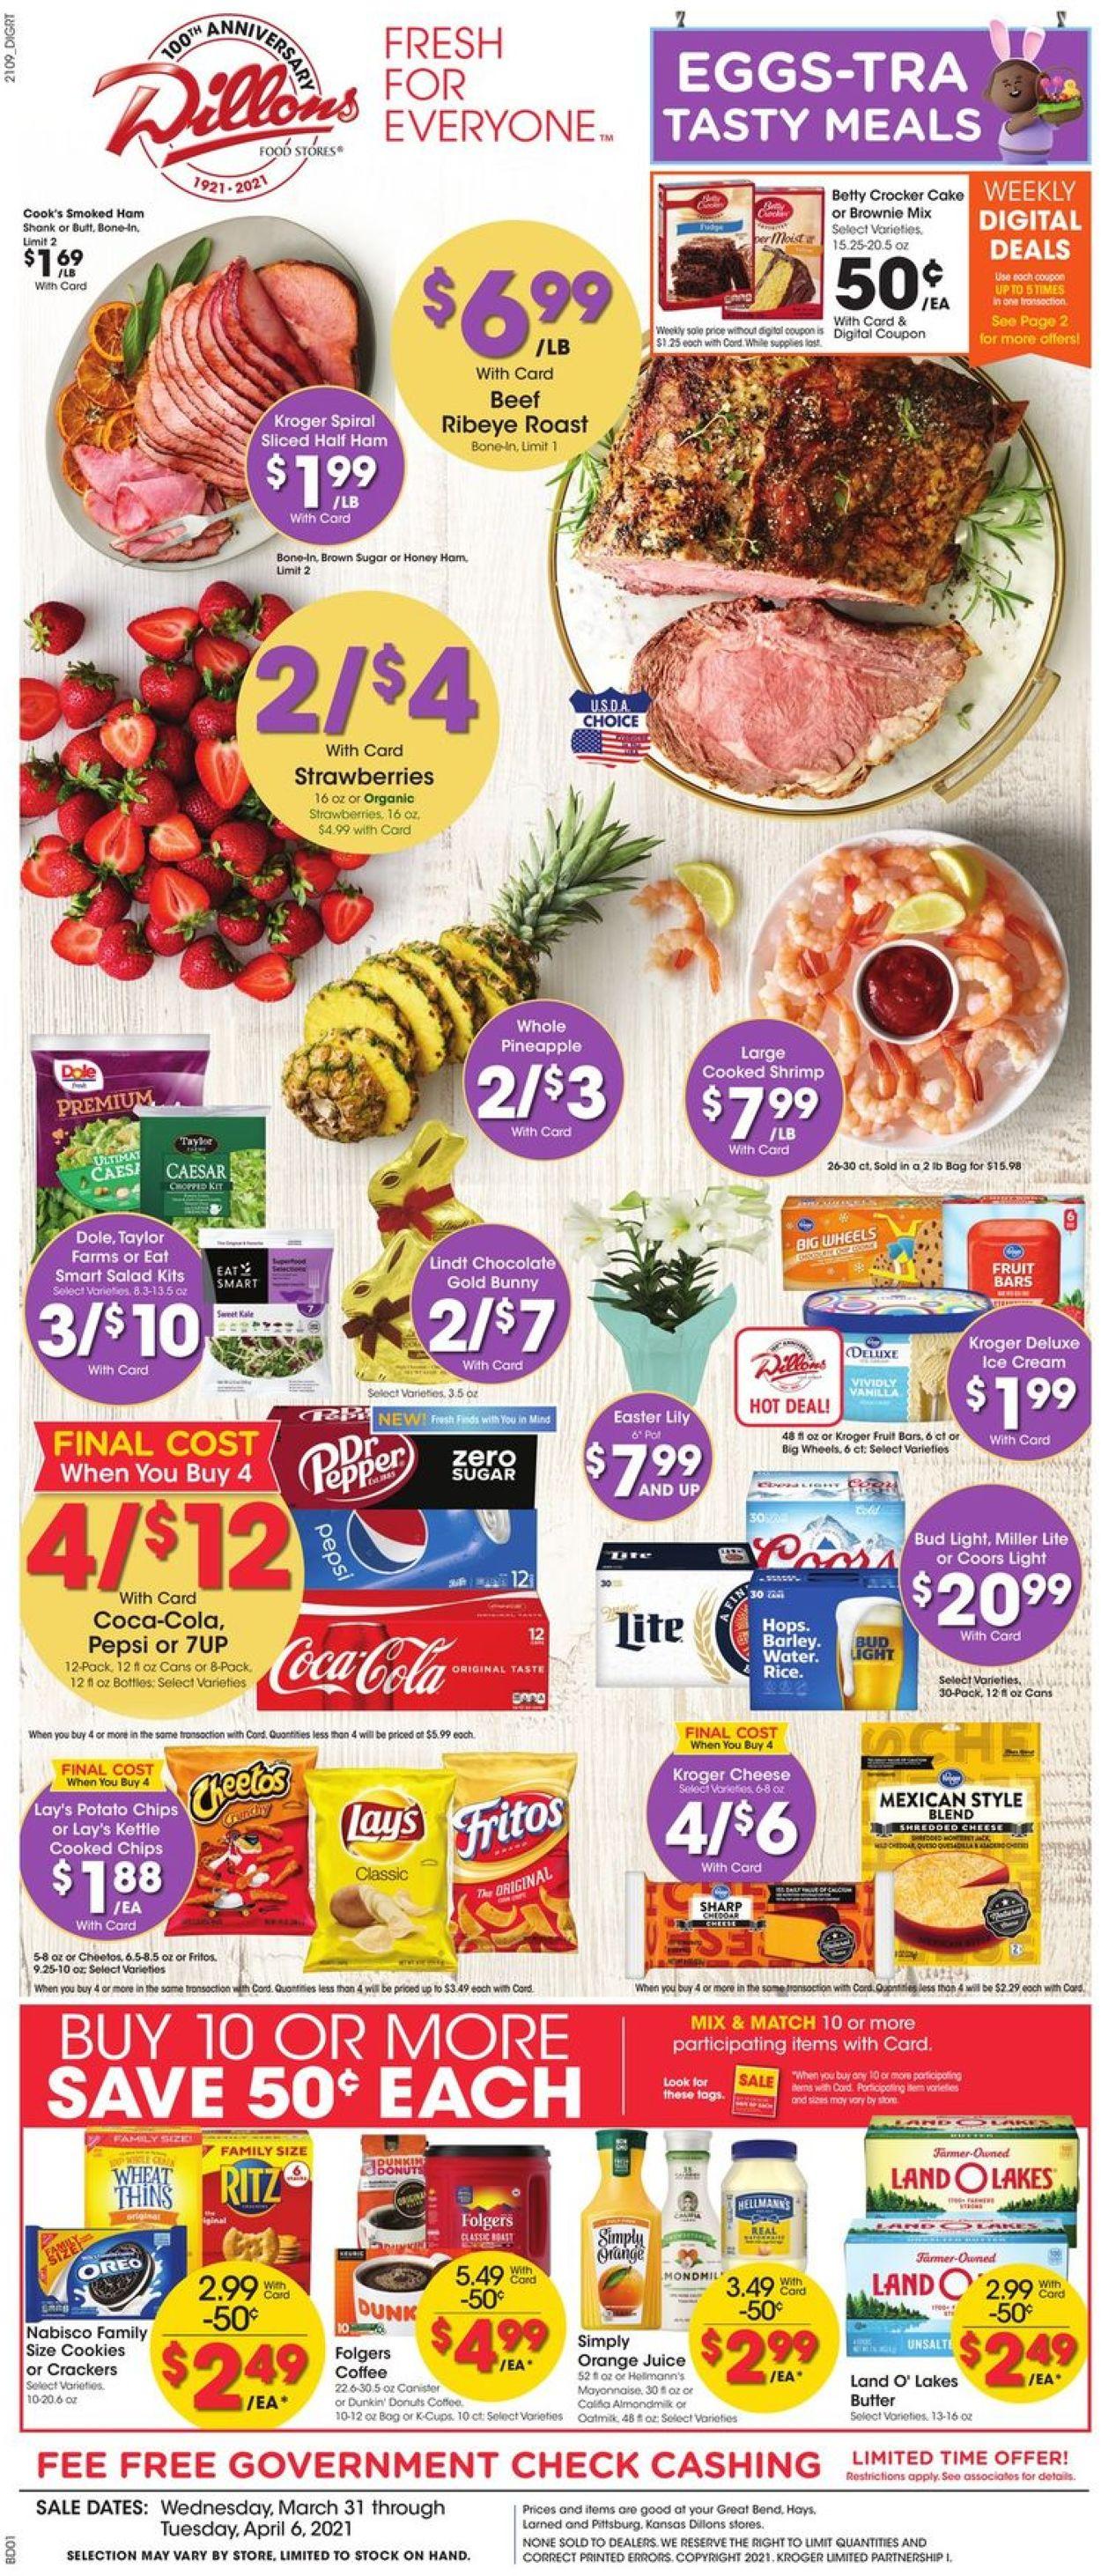 Dillons - Easter 2021 Weekly Ad Circular - valid 03/31-04/06/2021